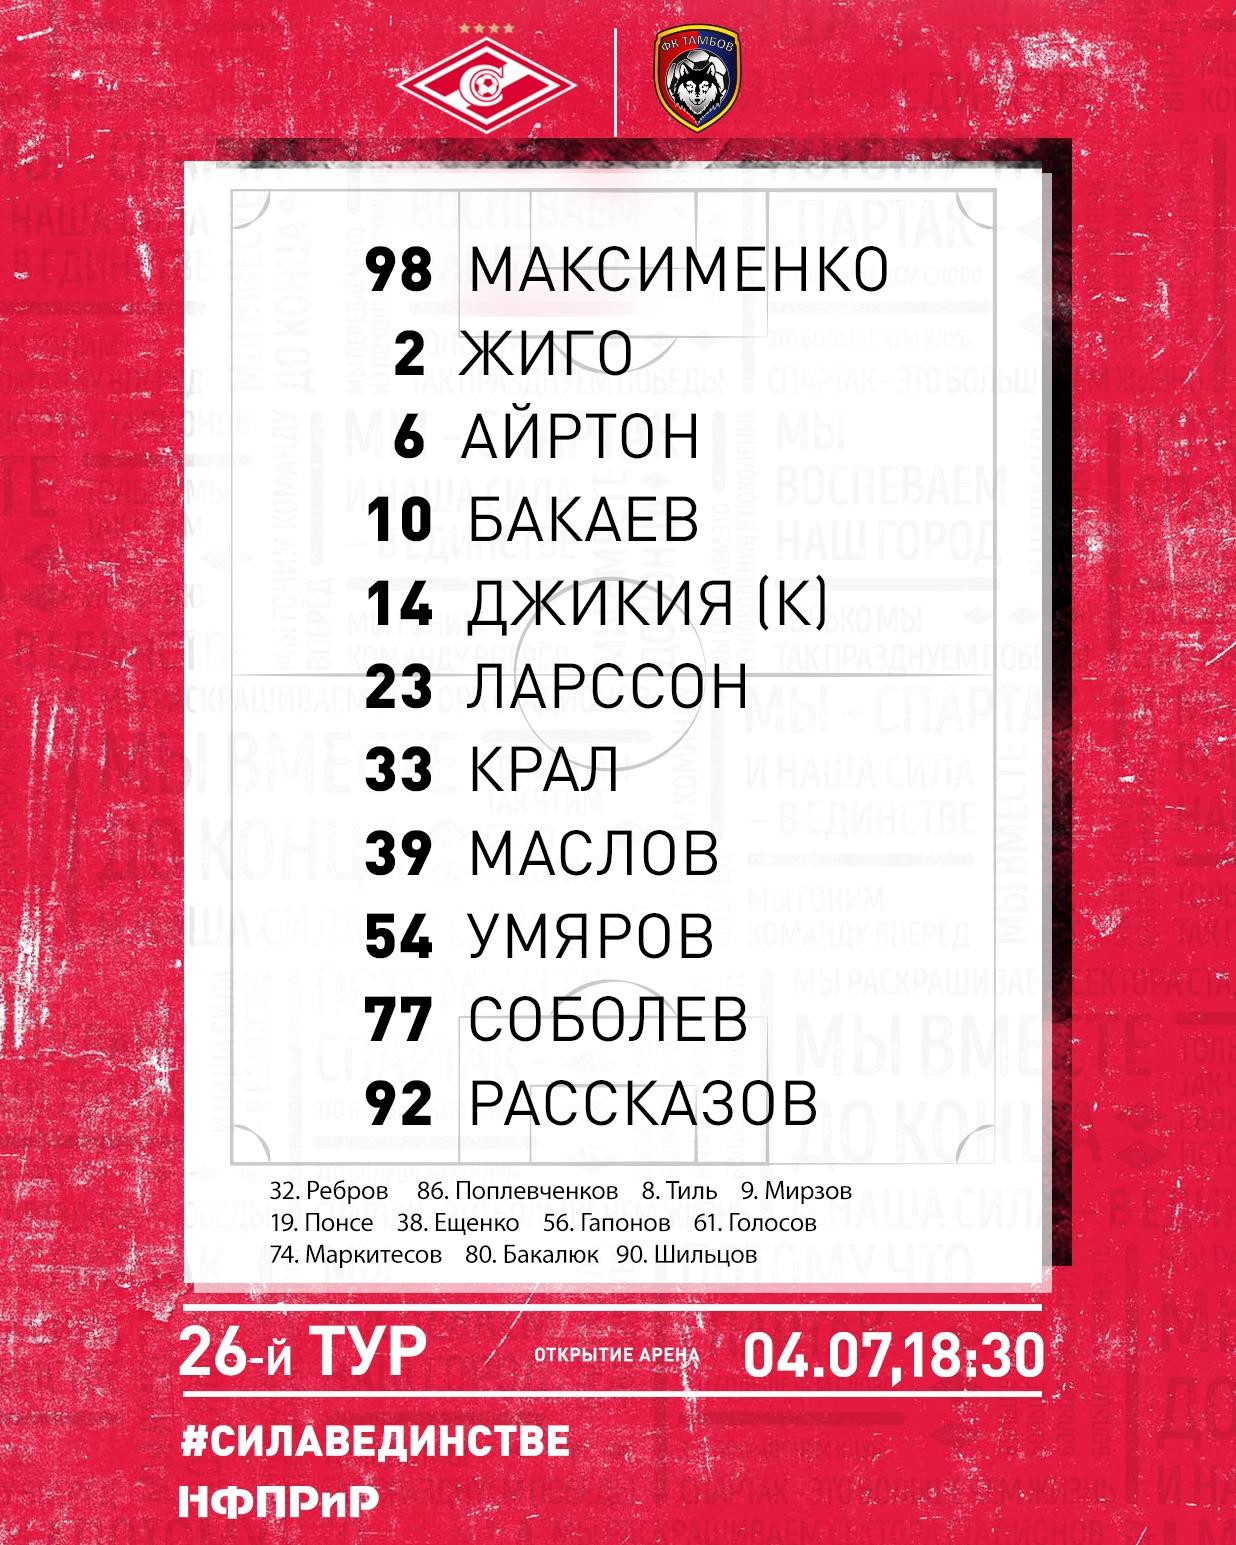 Состав «Спартака» на матч 26 тура с «Тамбовом»